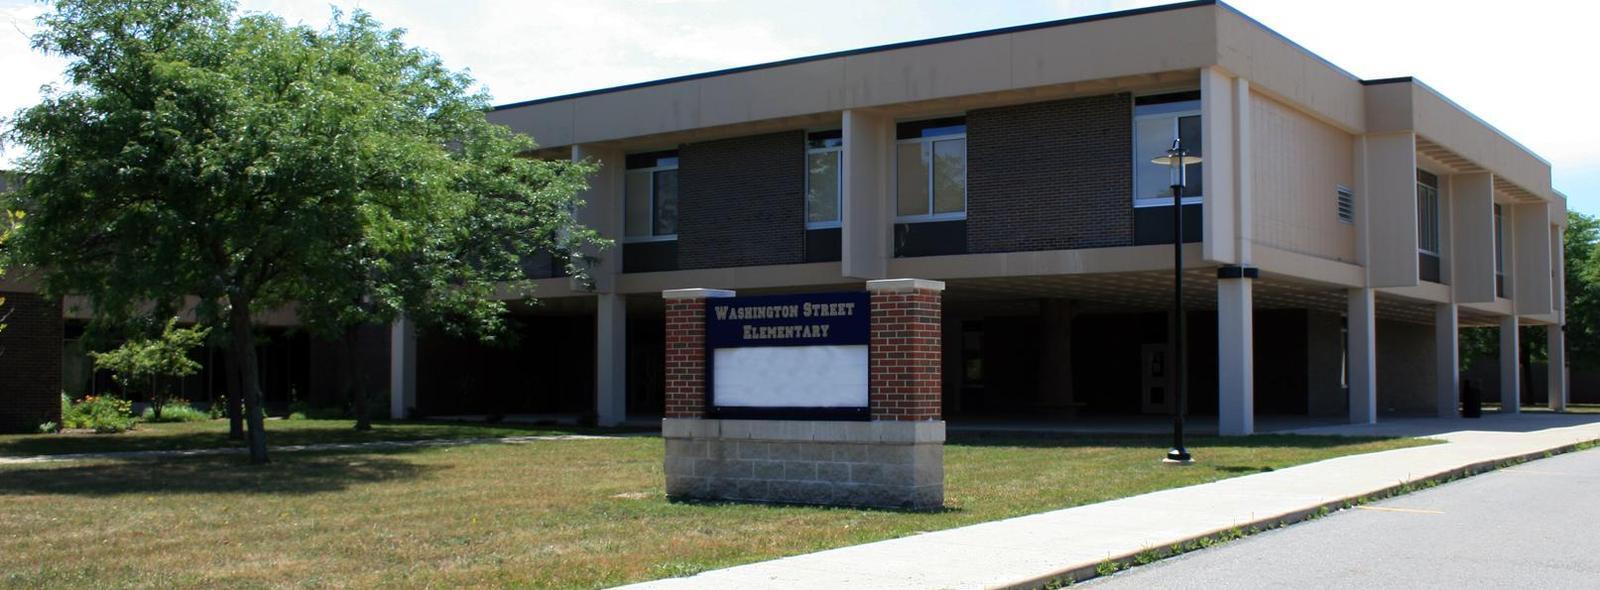 Exterior of Washington Street Elementary